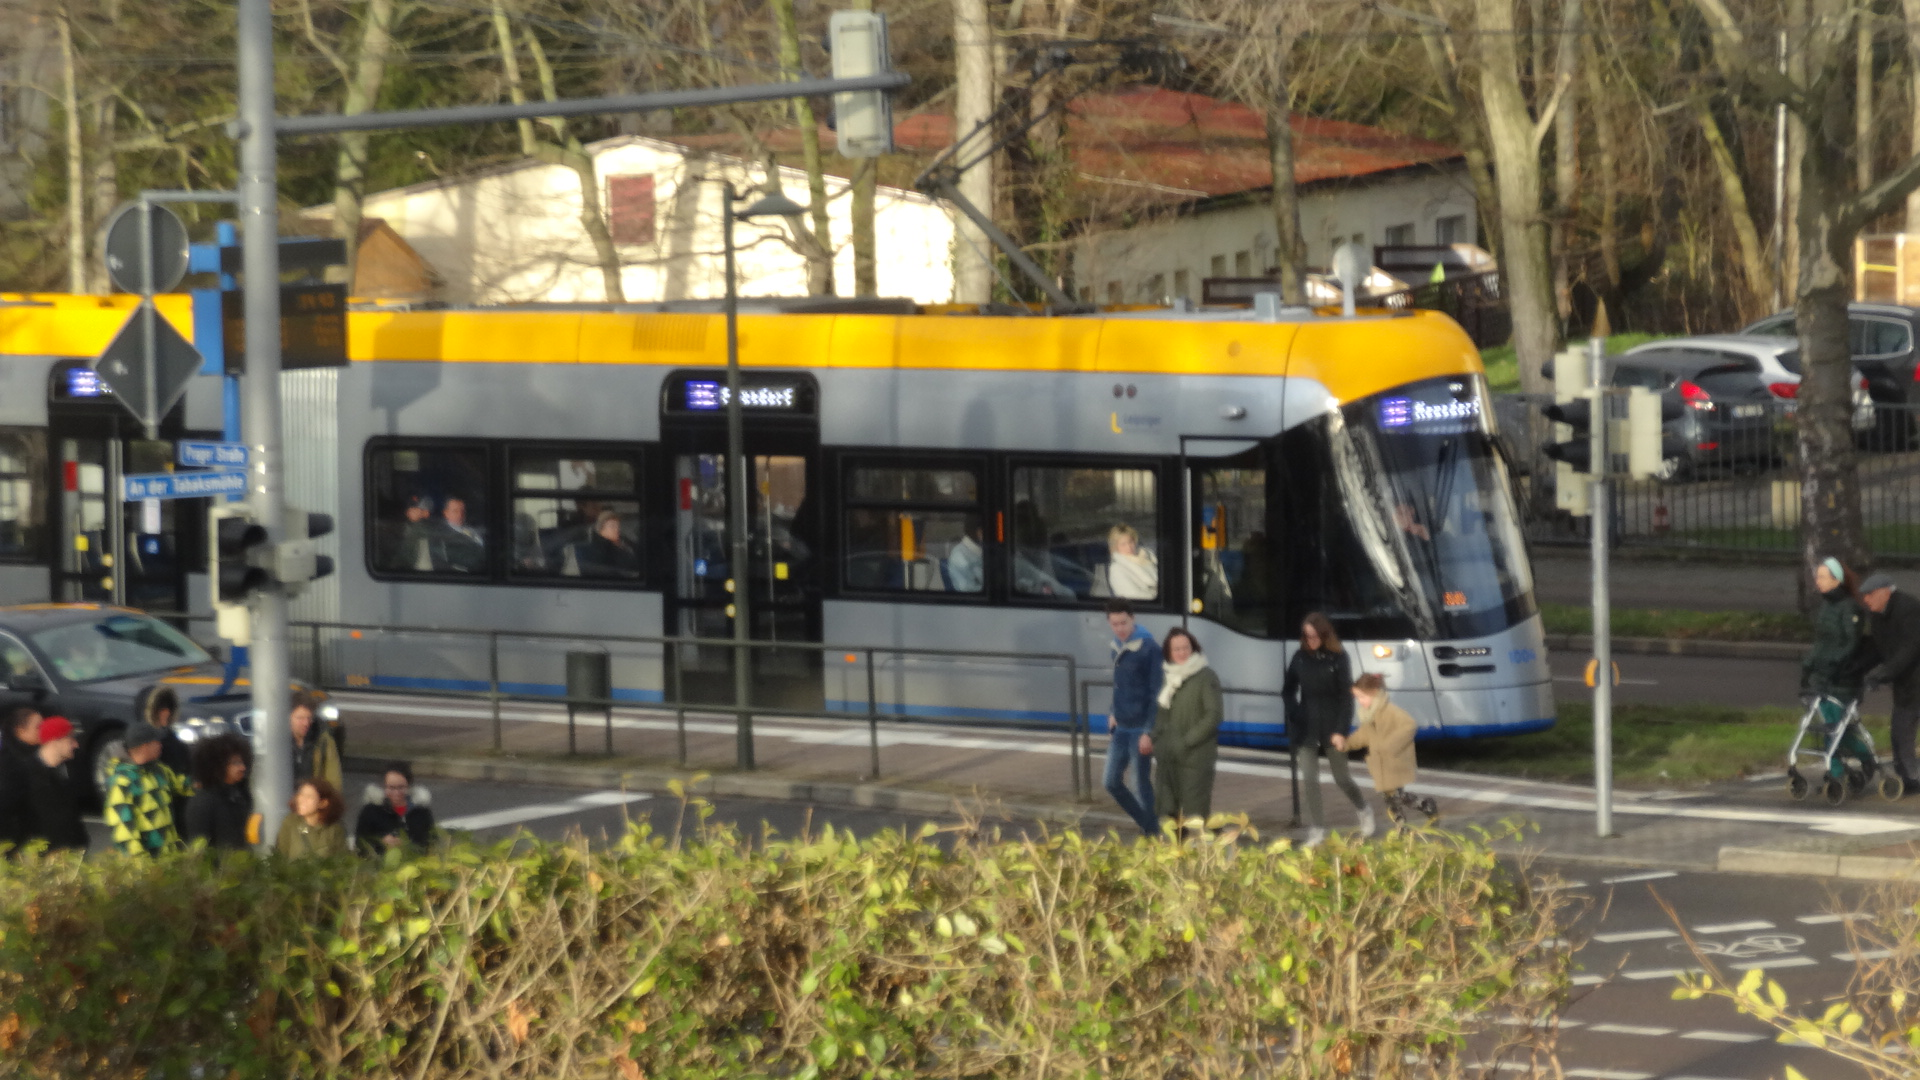 Newest tram